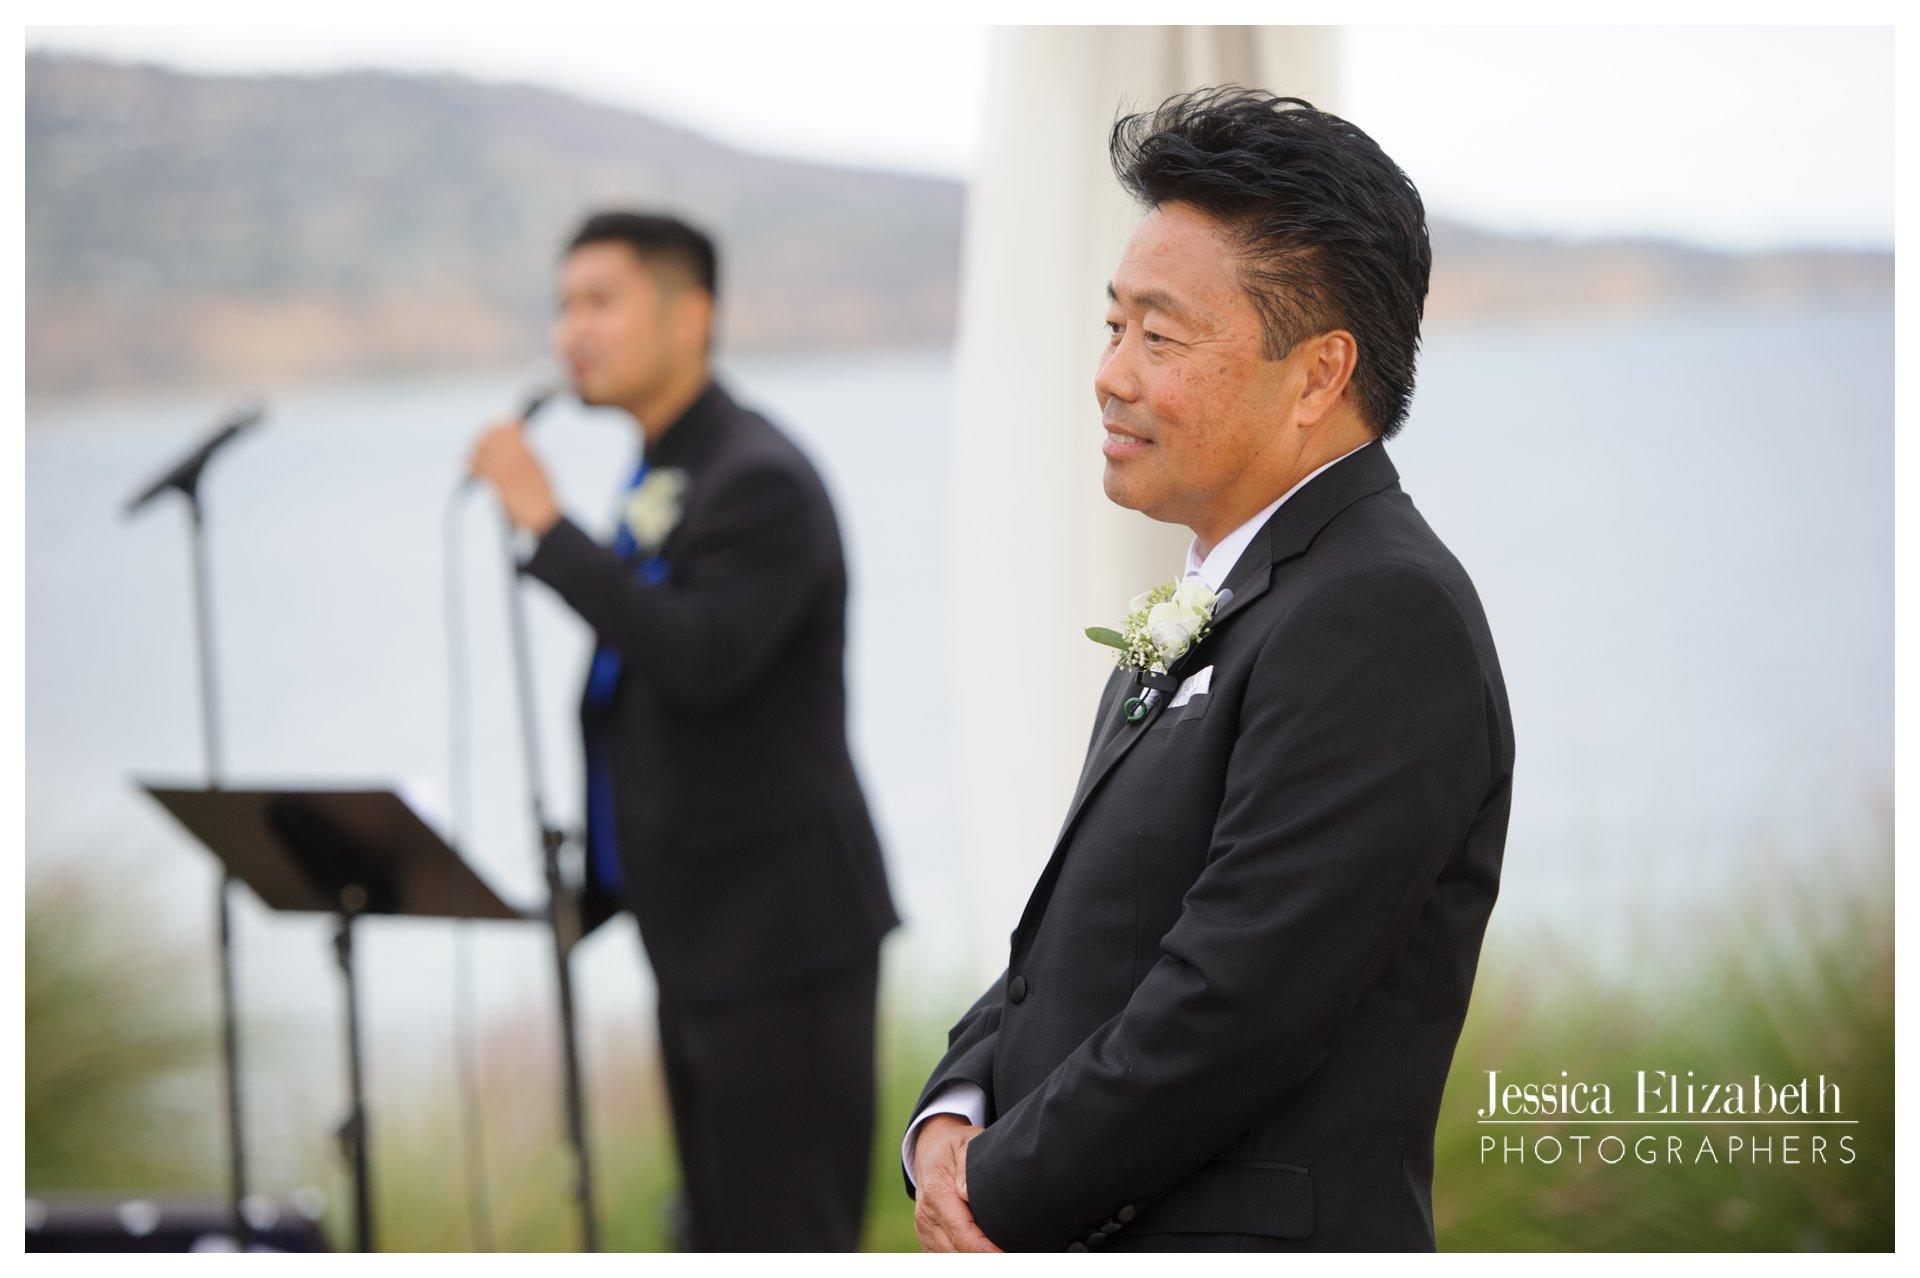 07-Terranea-Palos-Verdes-Wedding-Photography-by-Jessica-Elizabeth-w.jpg